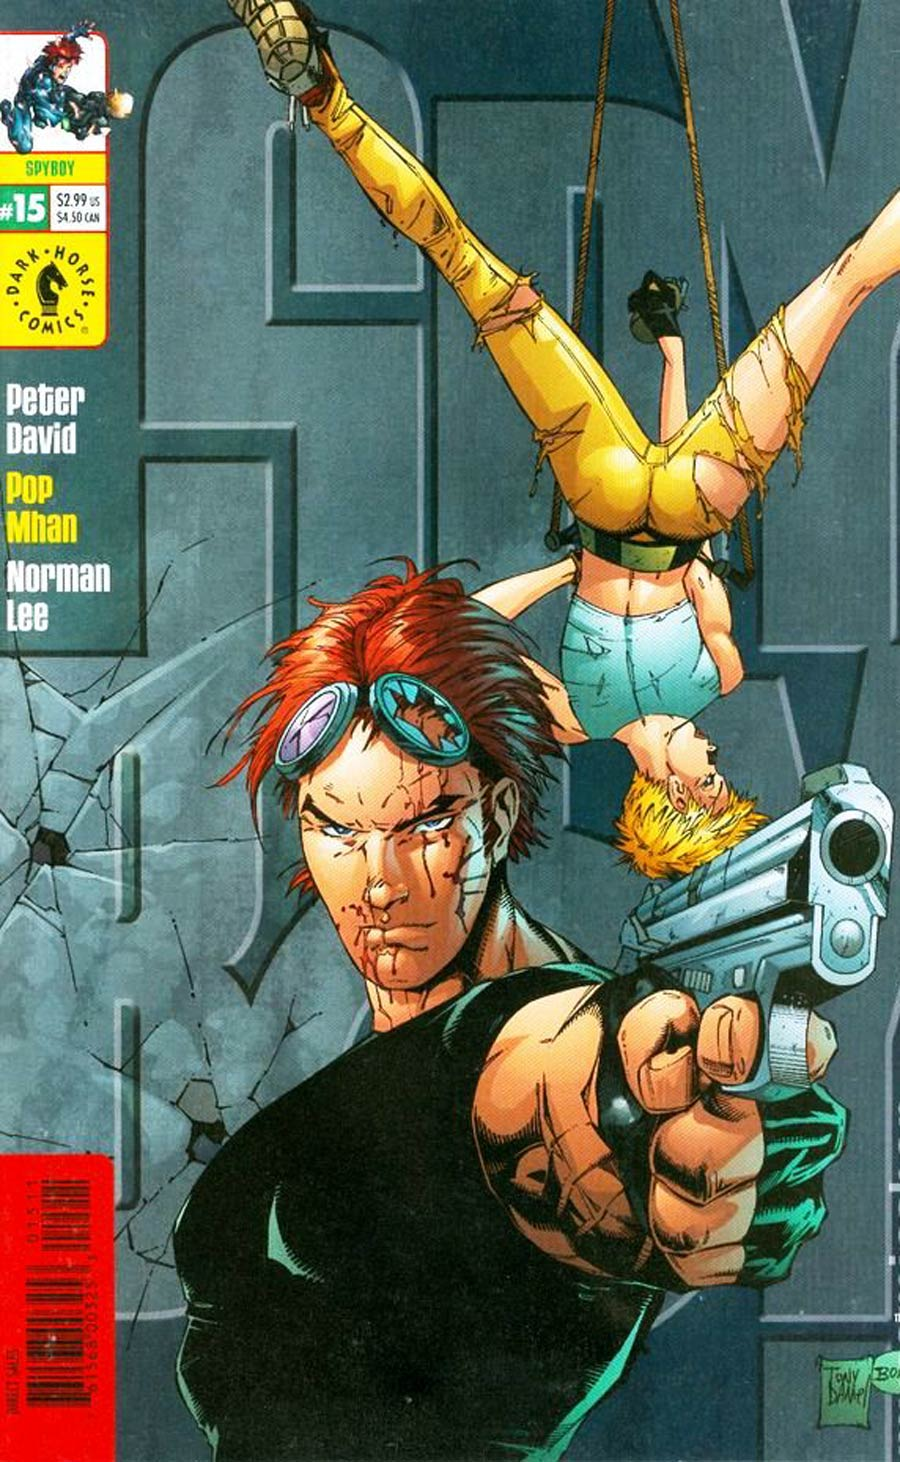 Spyboy #15 Cover B Tony Daniel